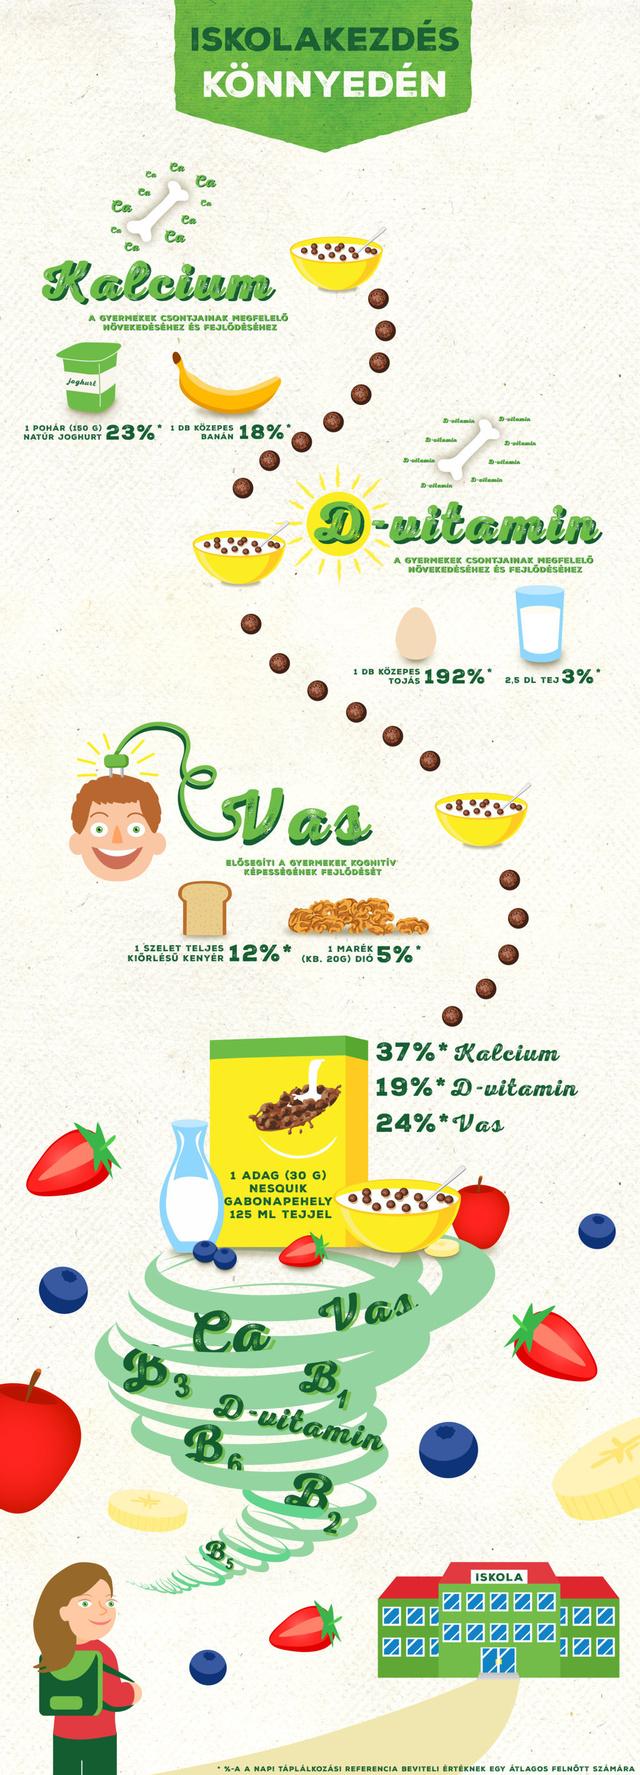 Iskolakezdes konnyeden infografika 20160830 online